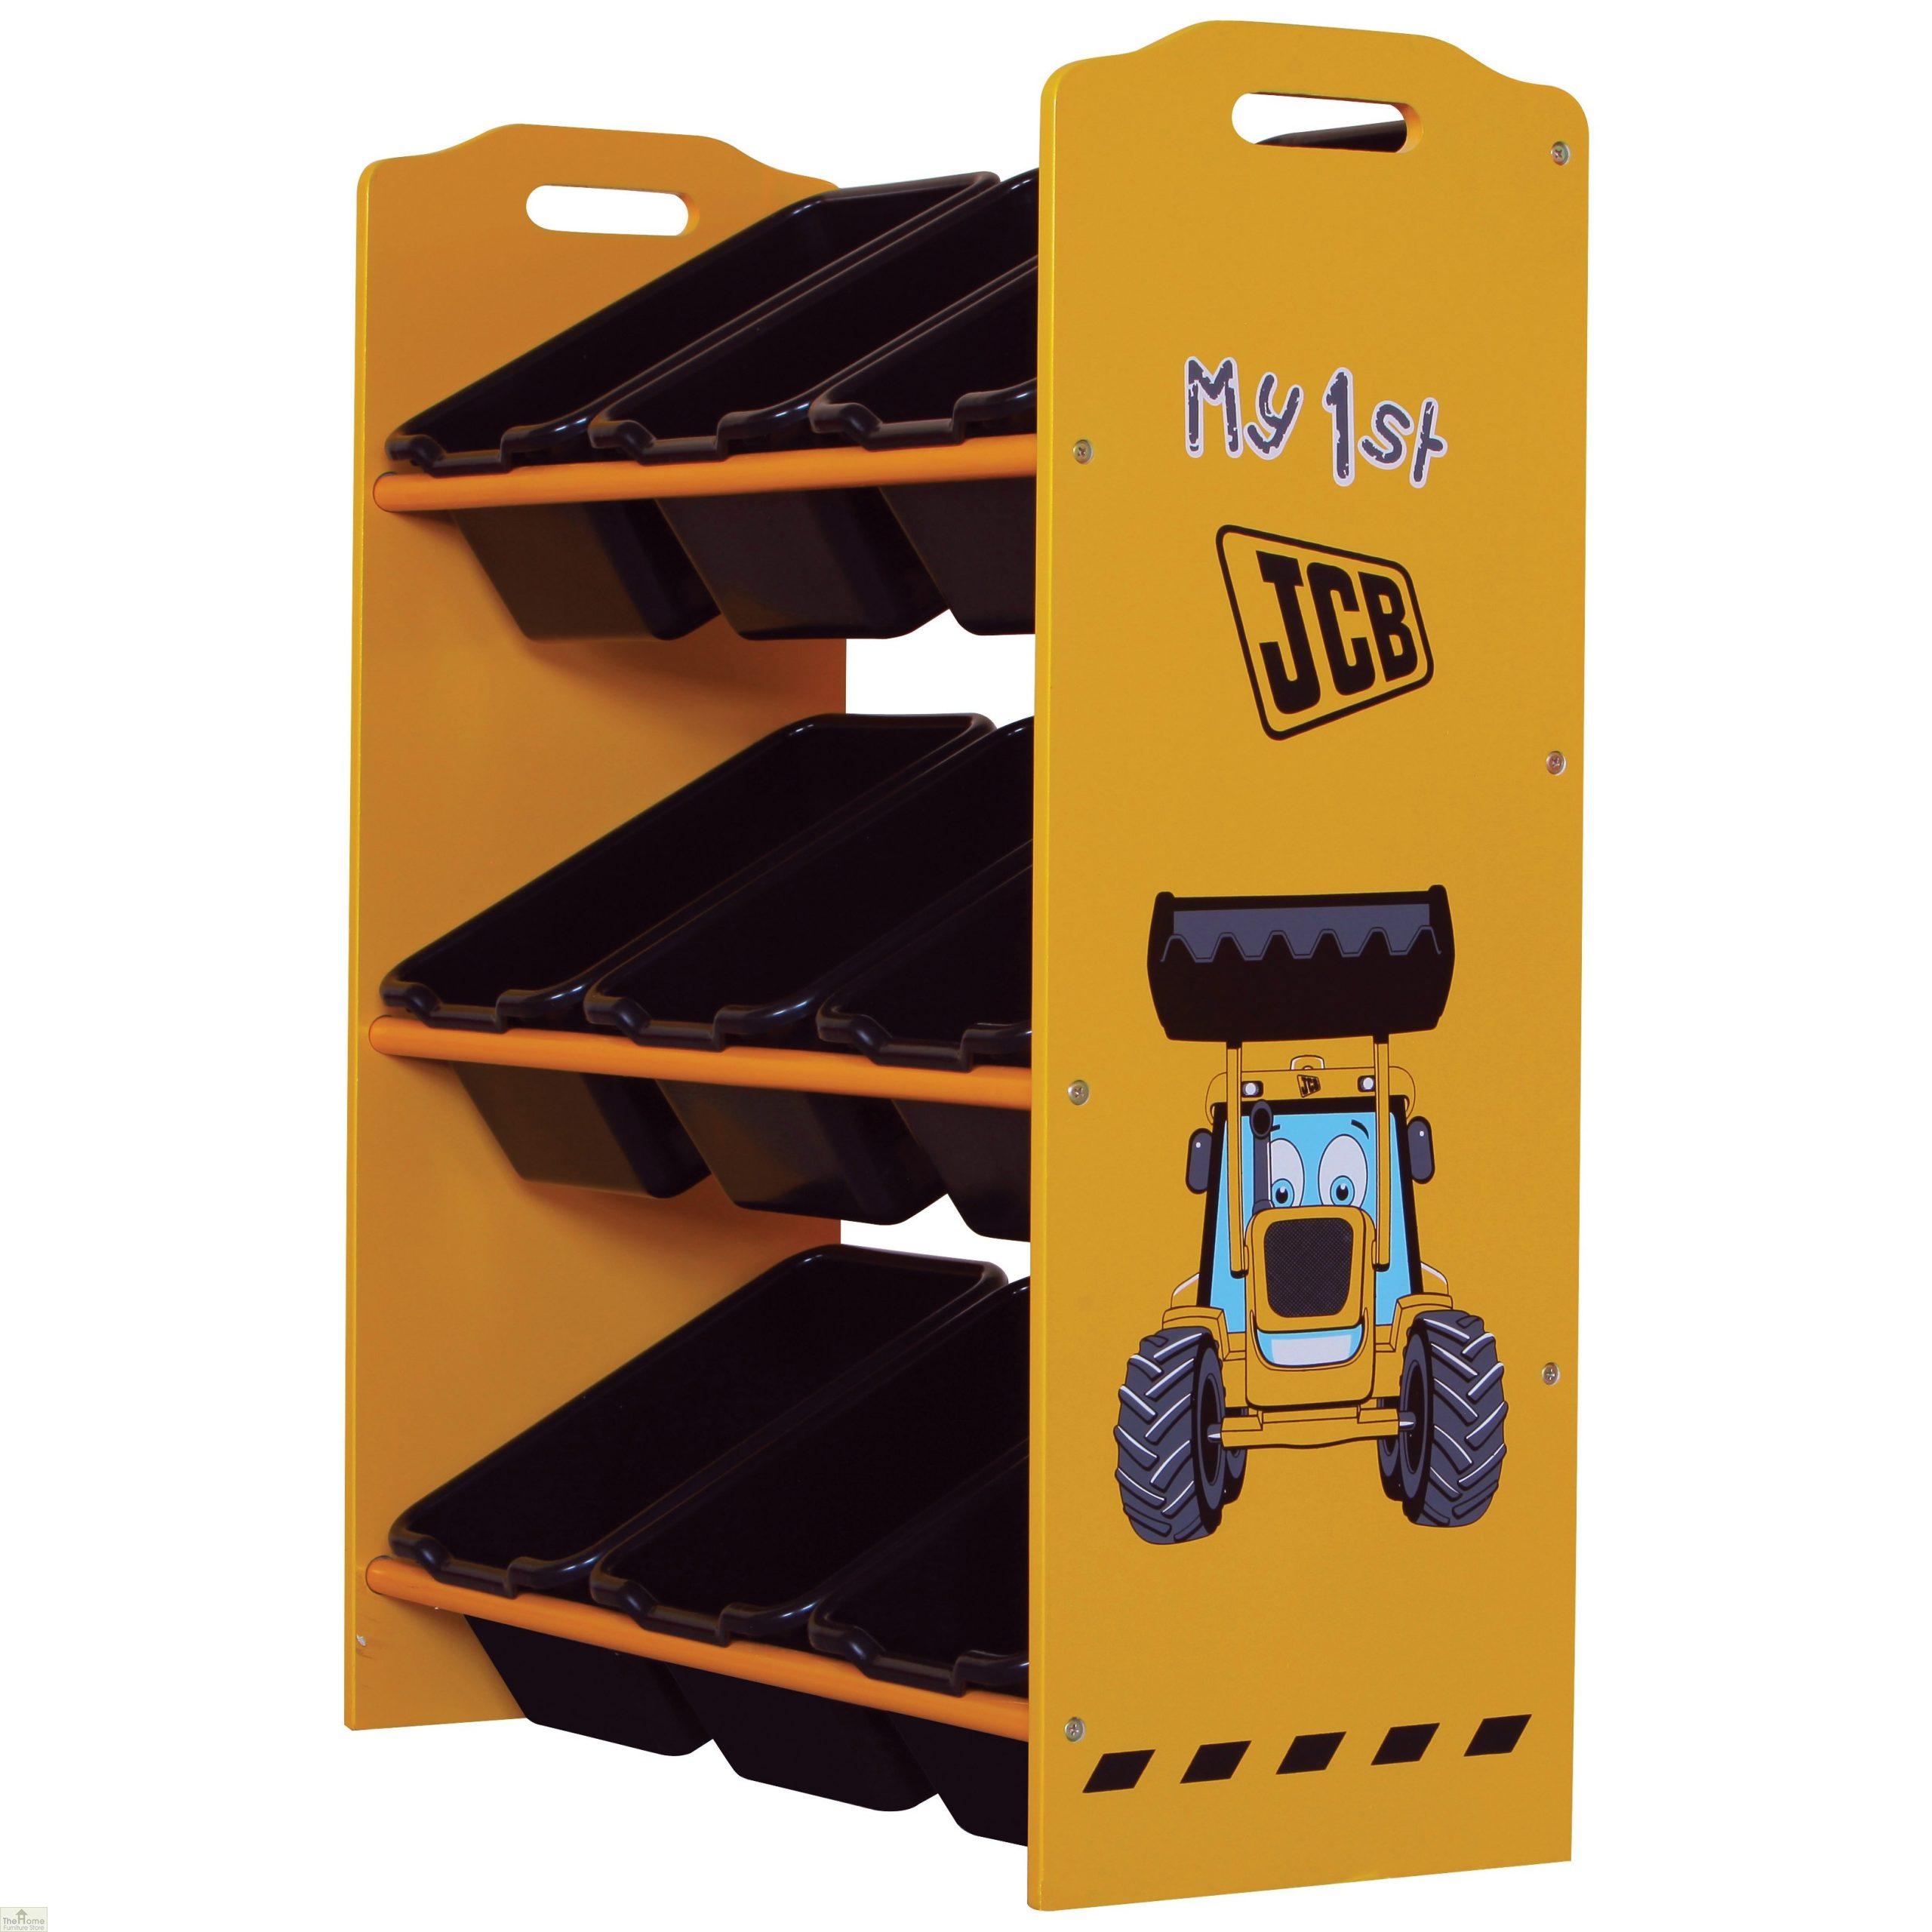 JCB 9 Bin Storage Unit